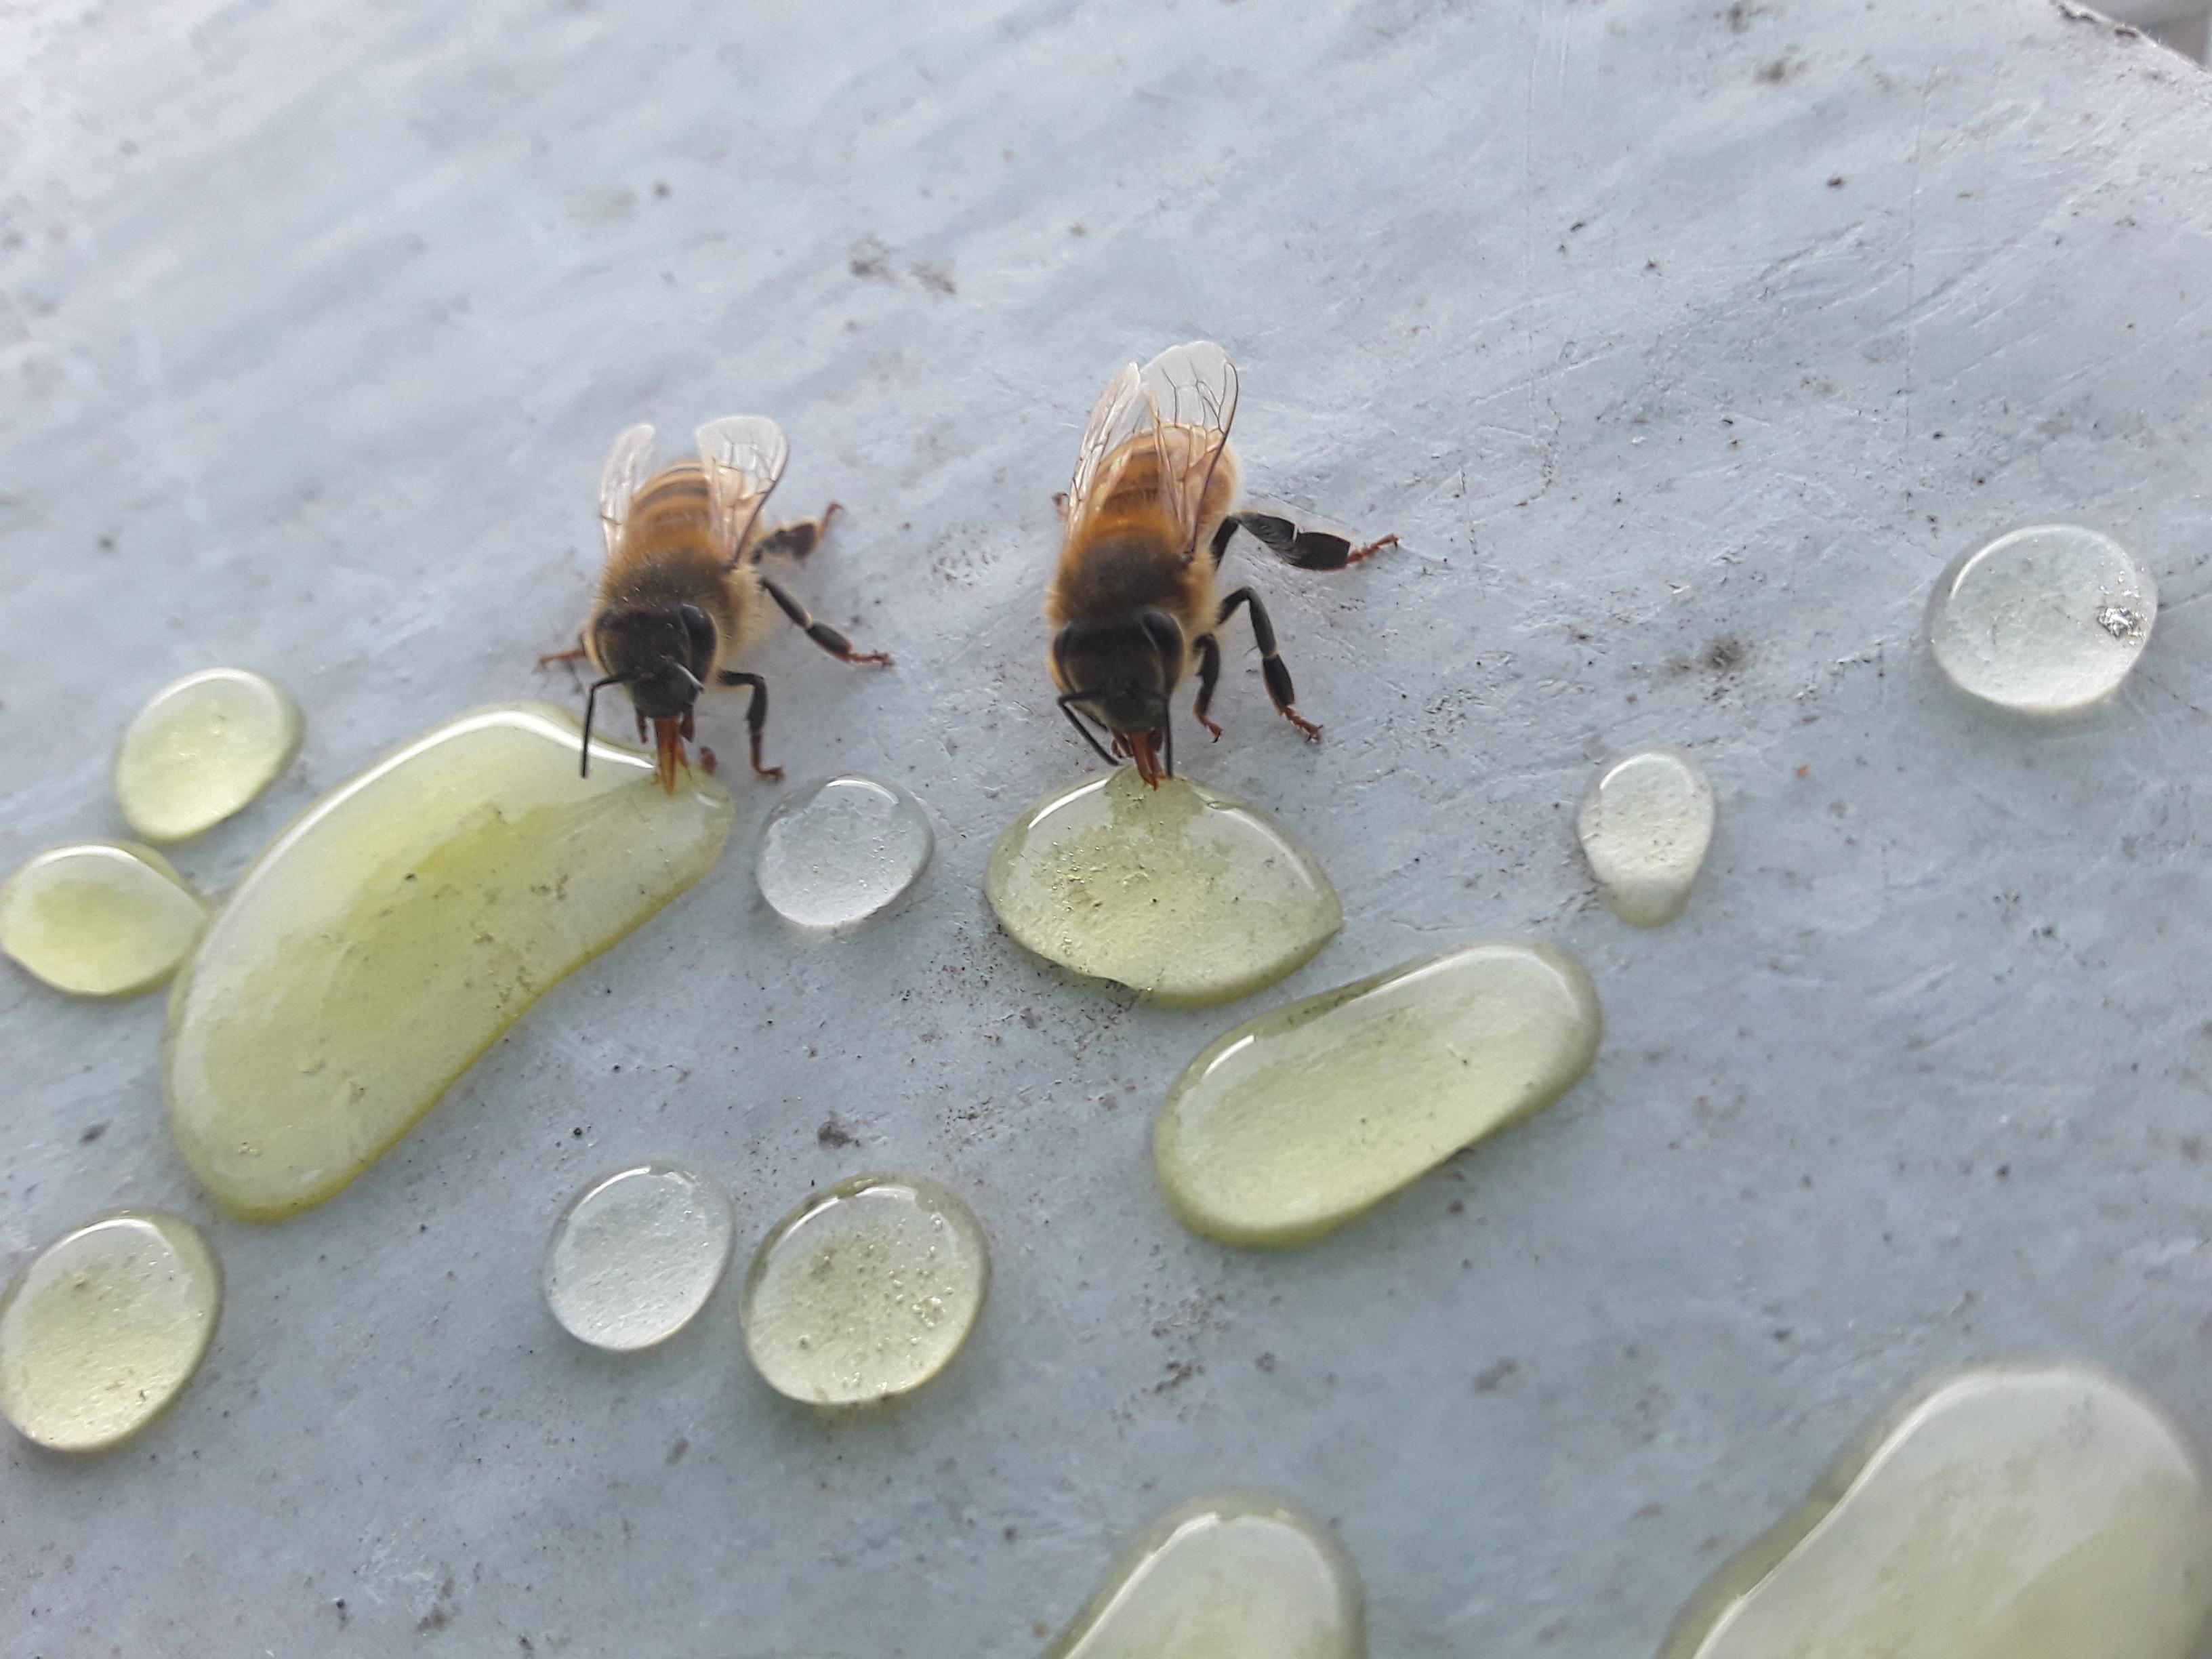 2019_06_12 bees eating honey_02